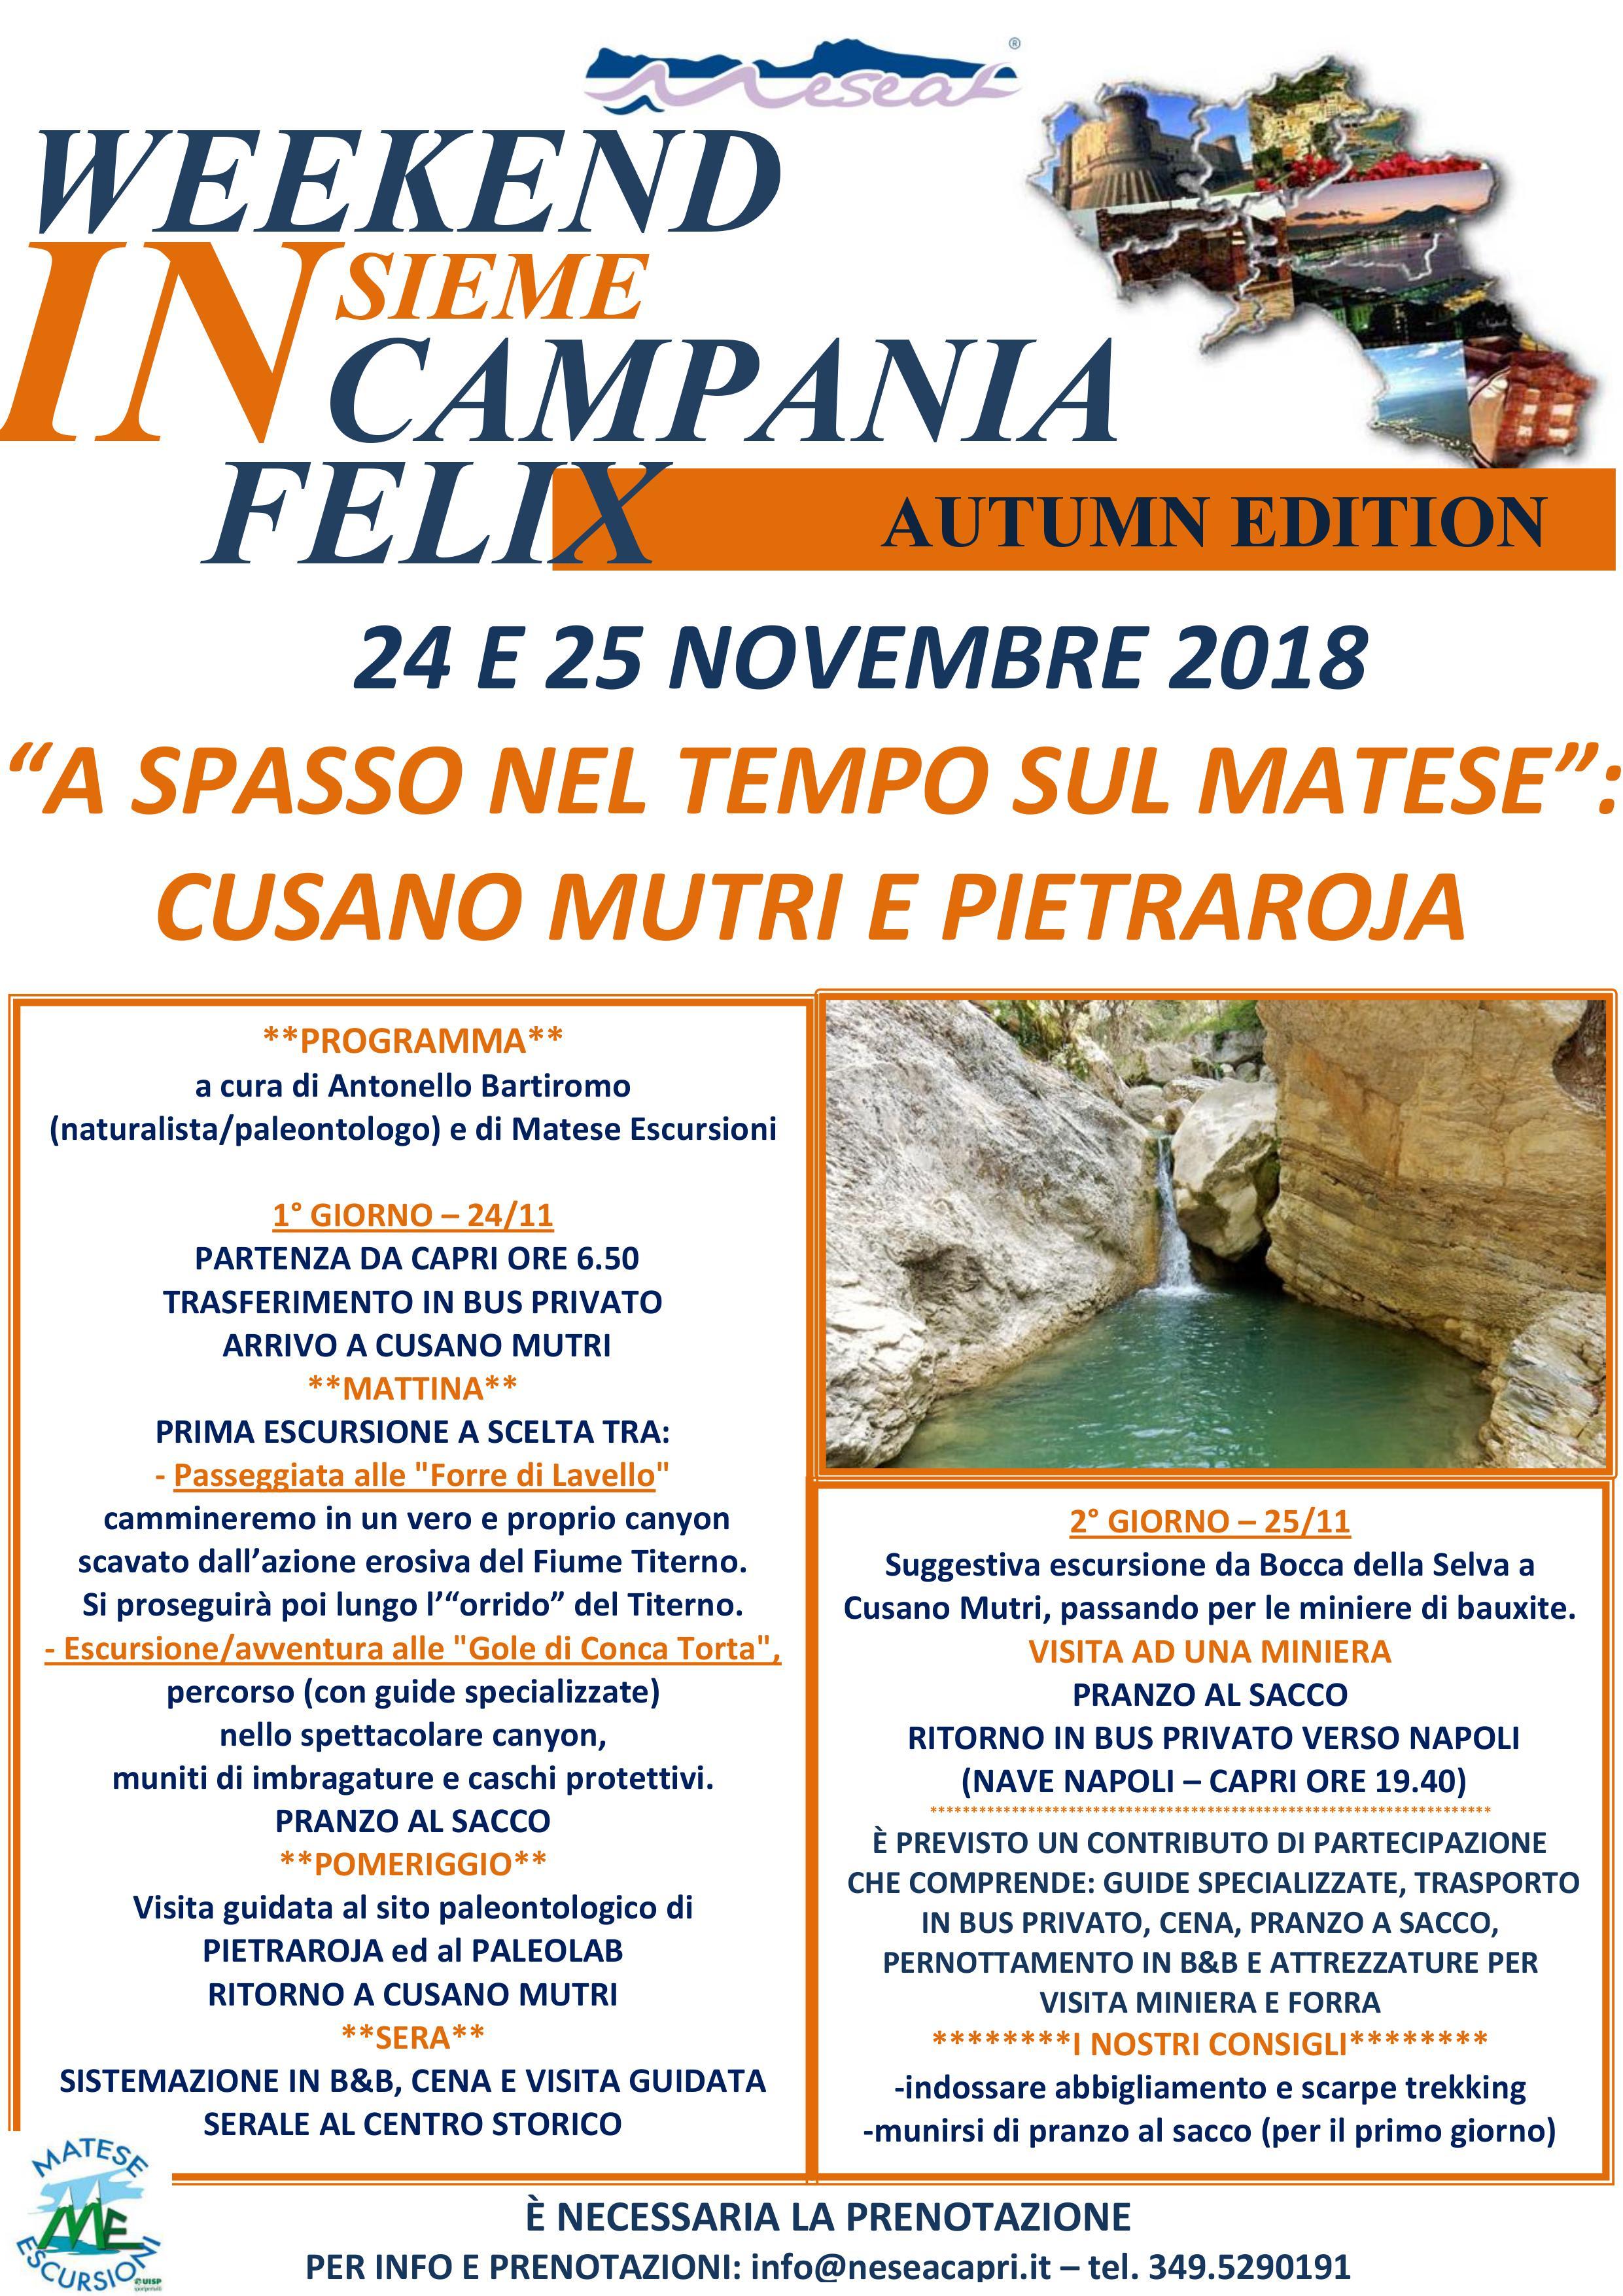 Weekend insieme in Campania Felix con Nesea, gli appuntamenti di fine Novembre